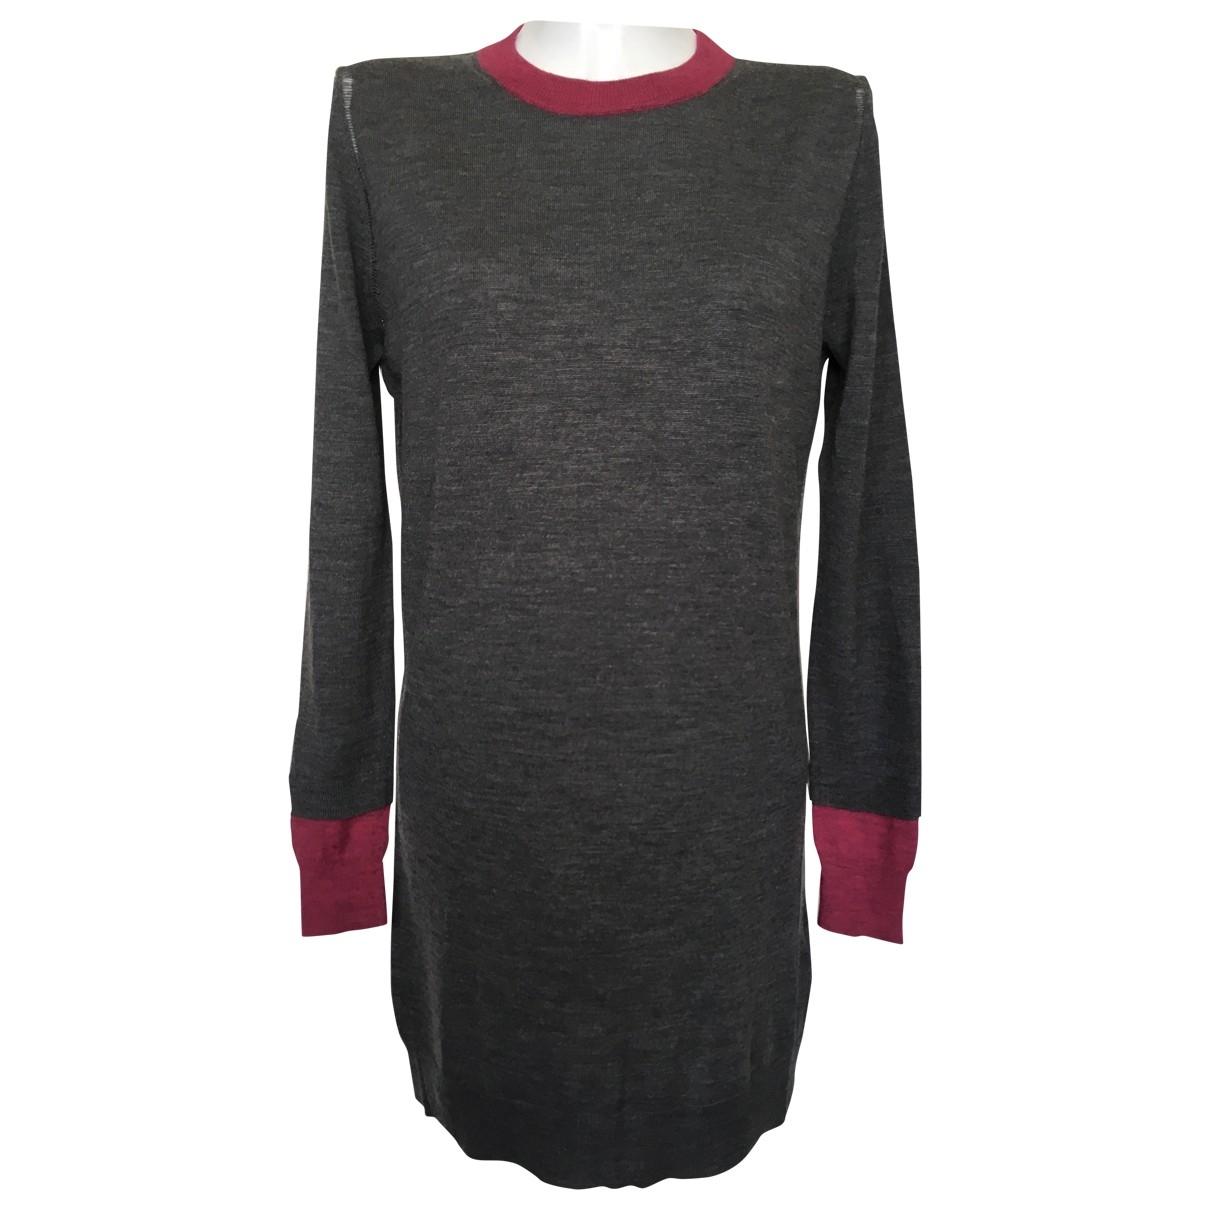 Zadig & Voltaire \N Grey Wool dress for Women S International